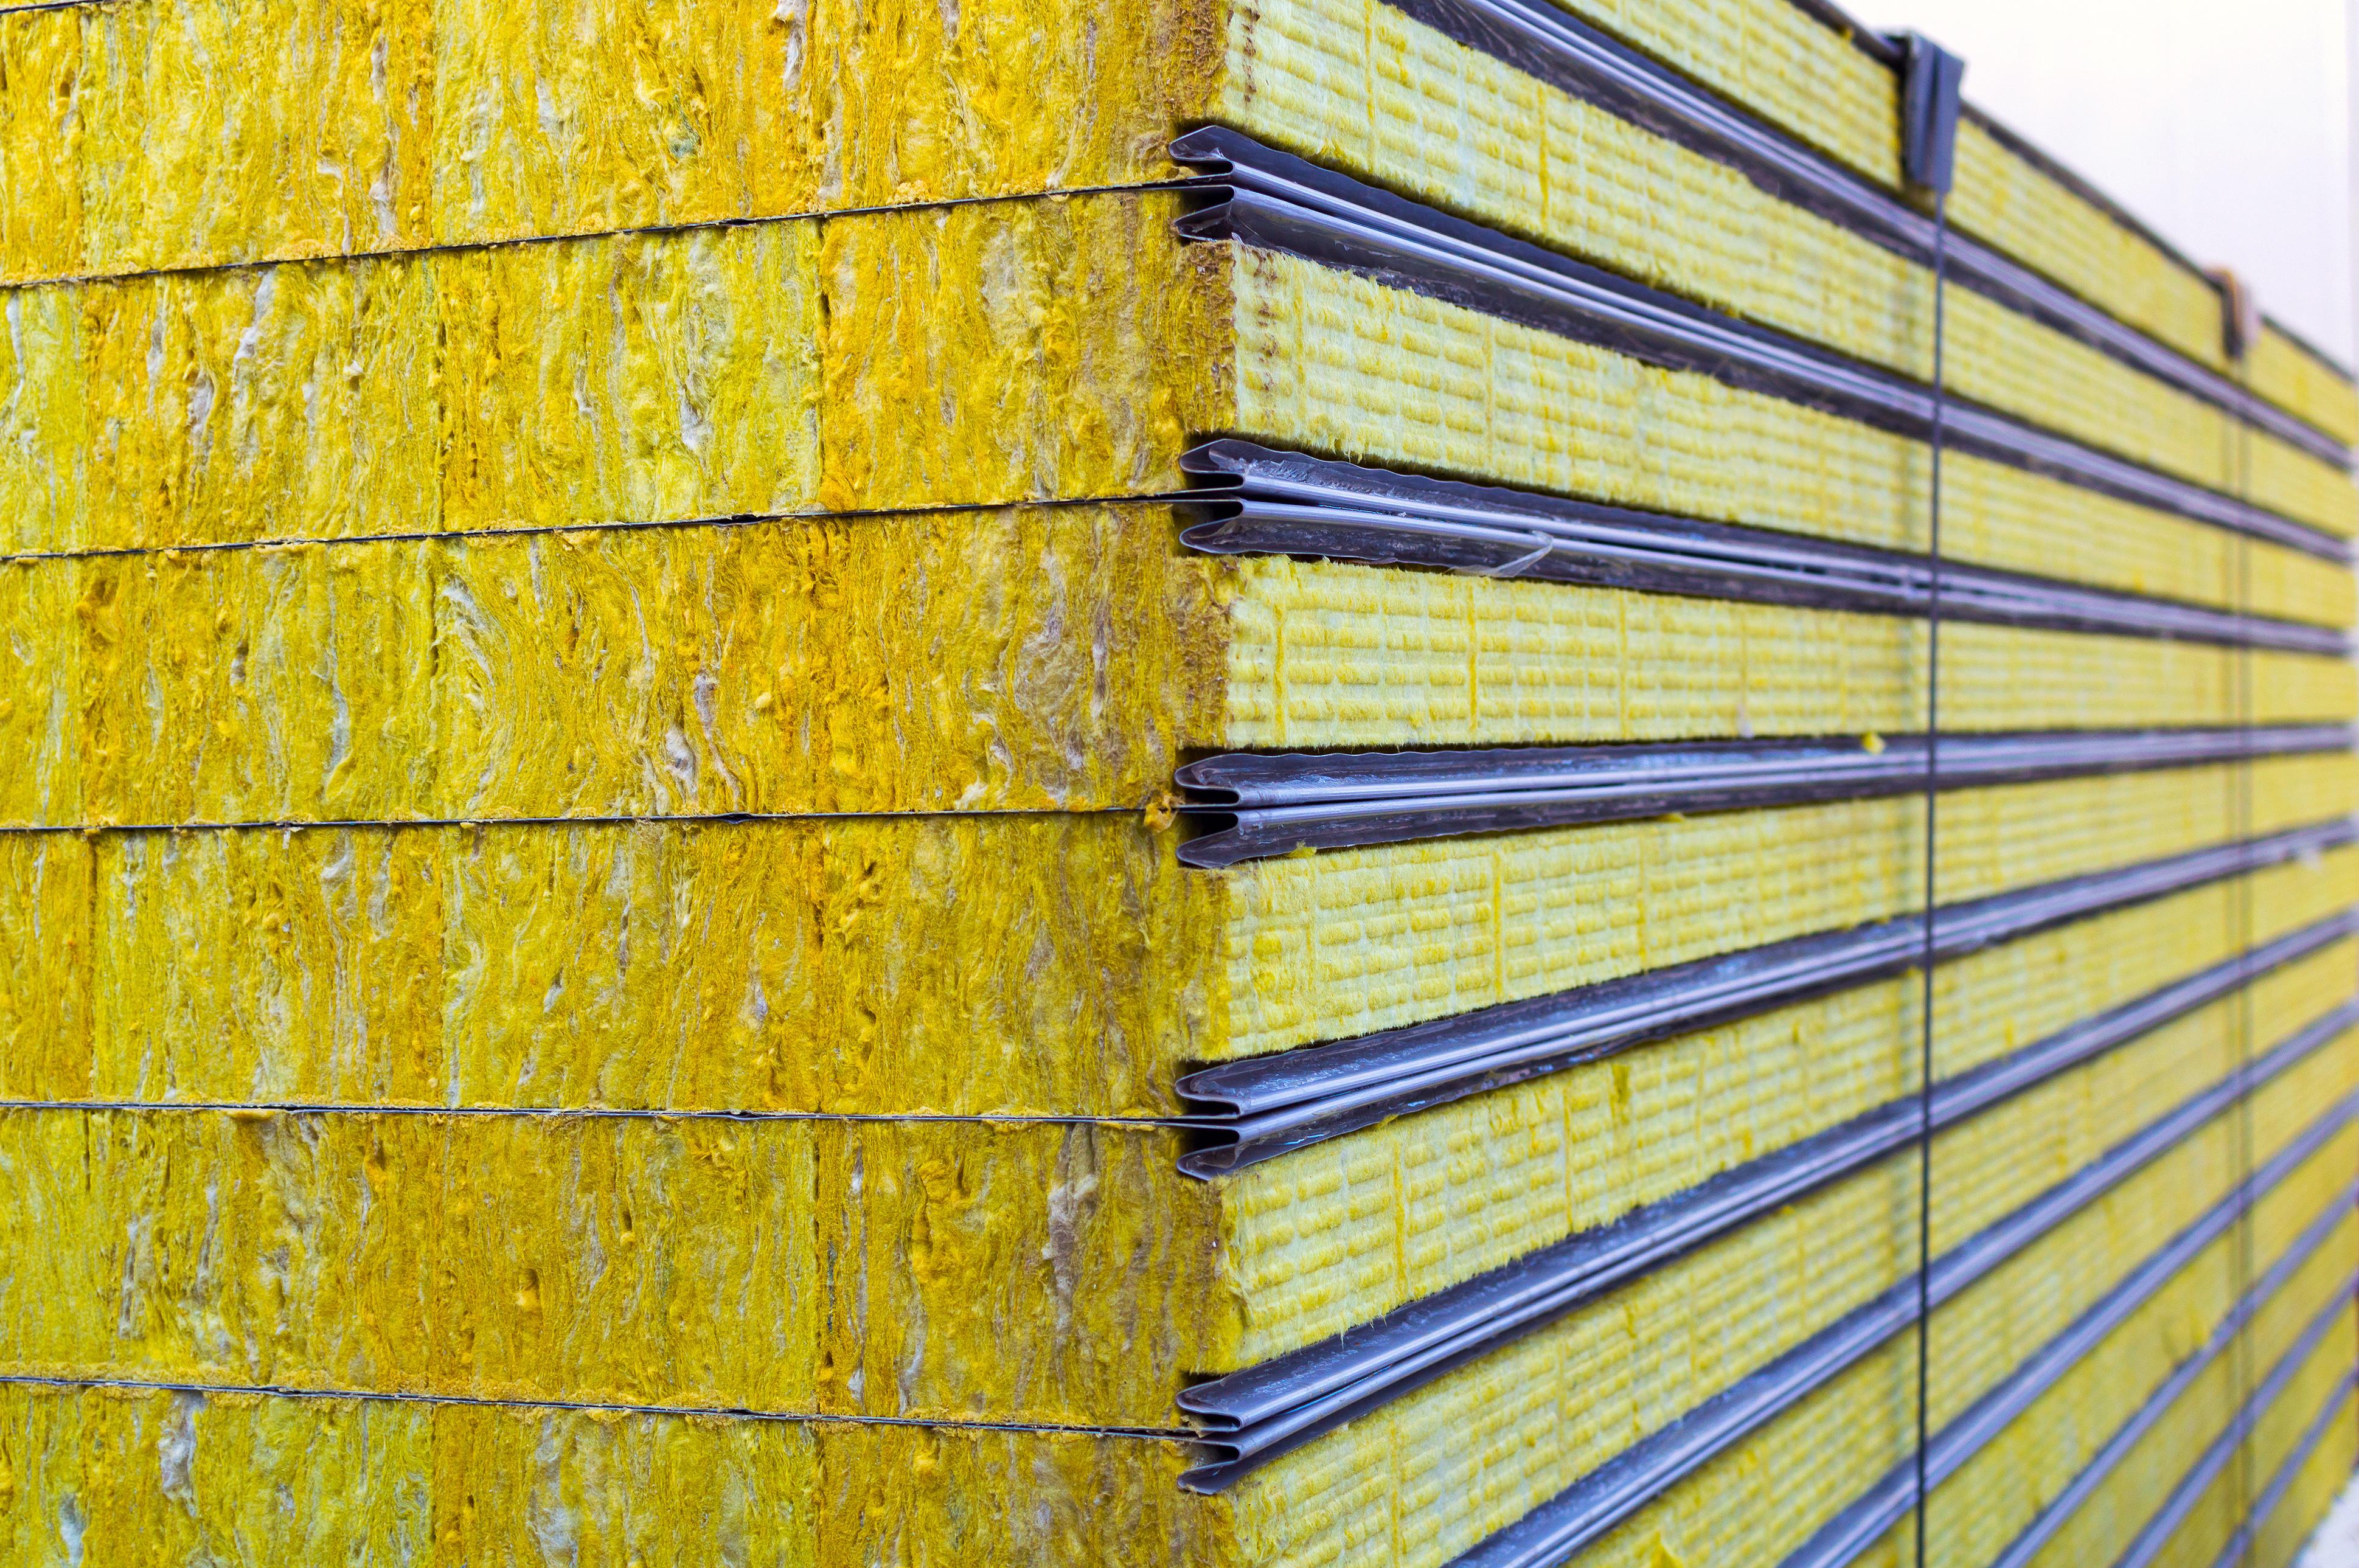 handling instructions insulated metal panel, importación de paneles aislados